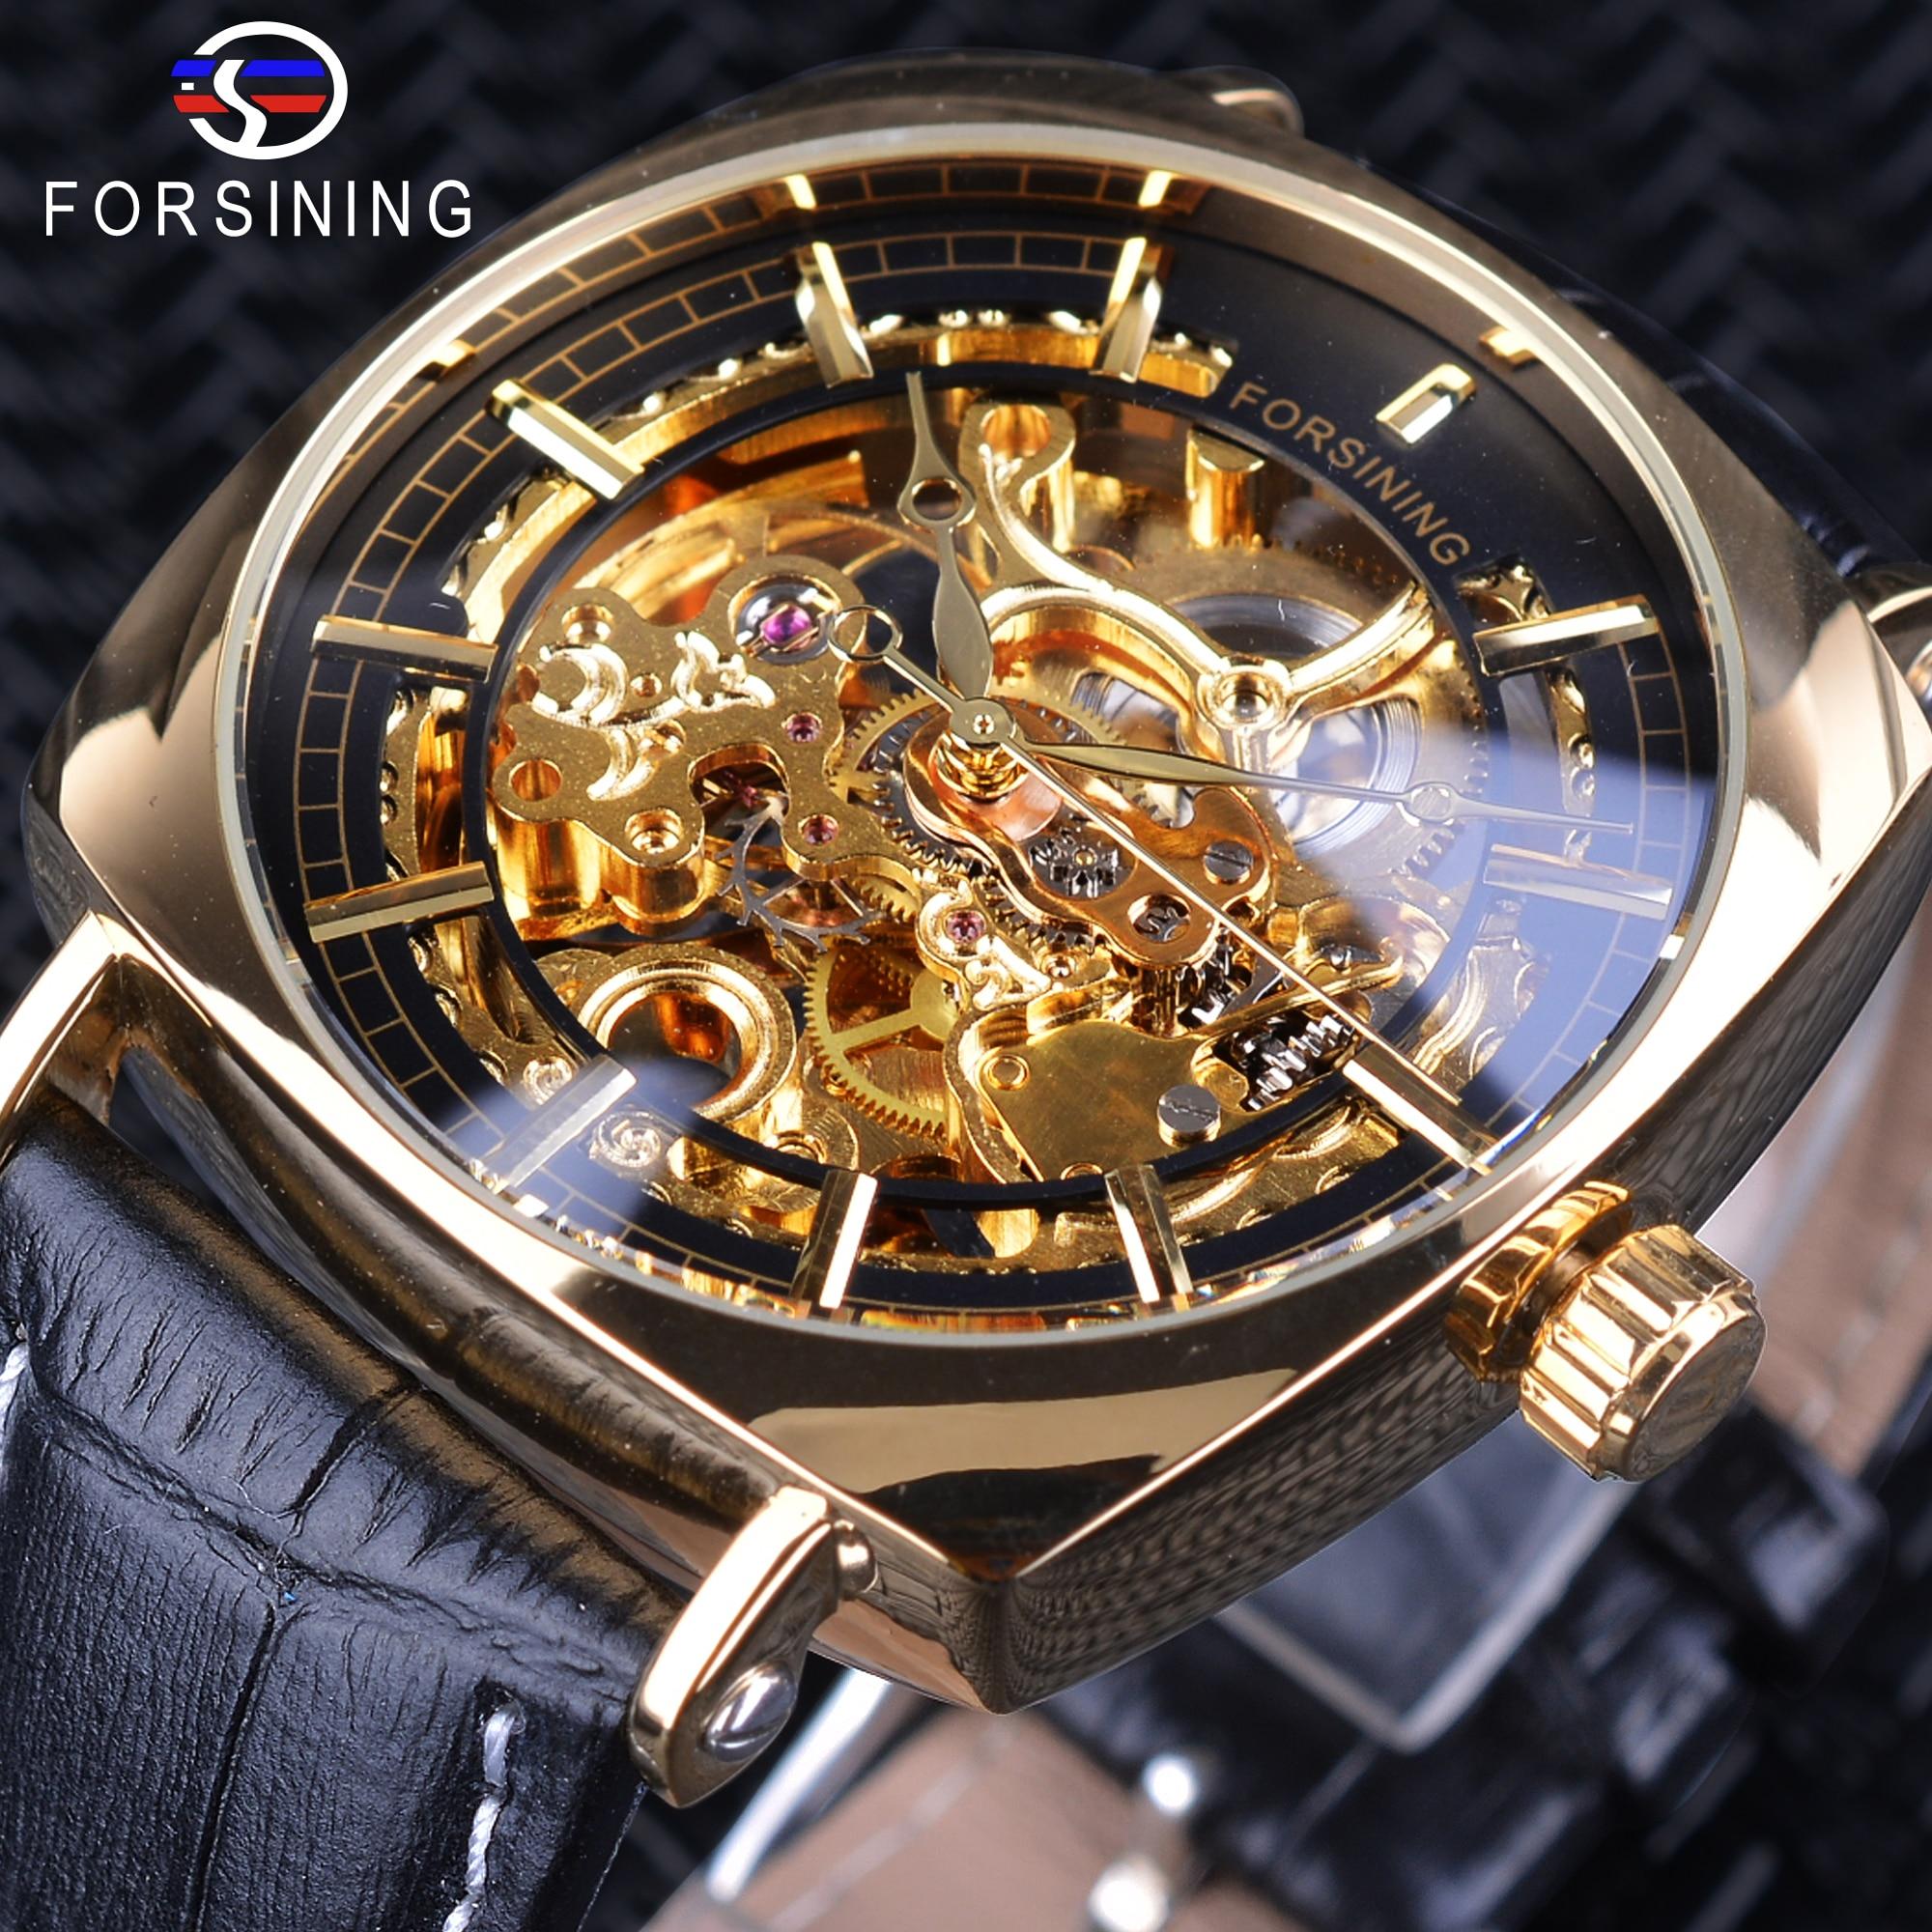 Forsining 2018 Creative Watch Waterproof Luxury Golden Skeleton Mechanical Watches Black Genuine Leather Mens Wristwatches Clock